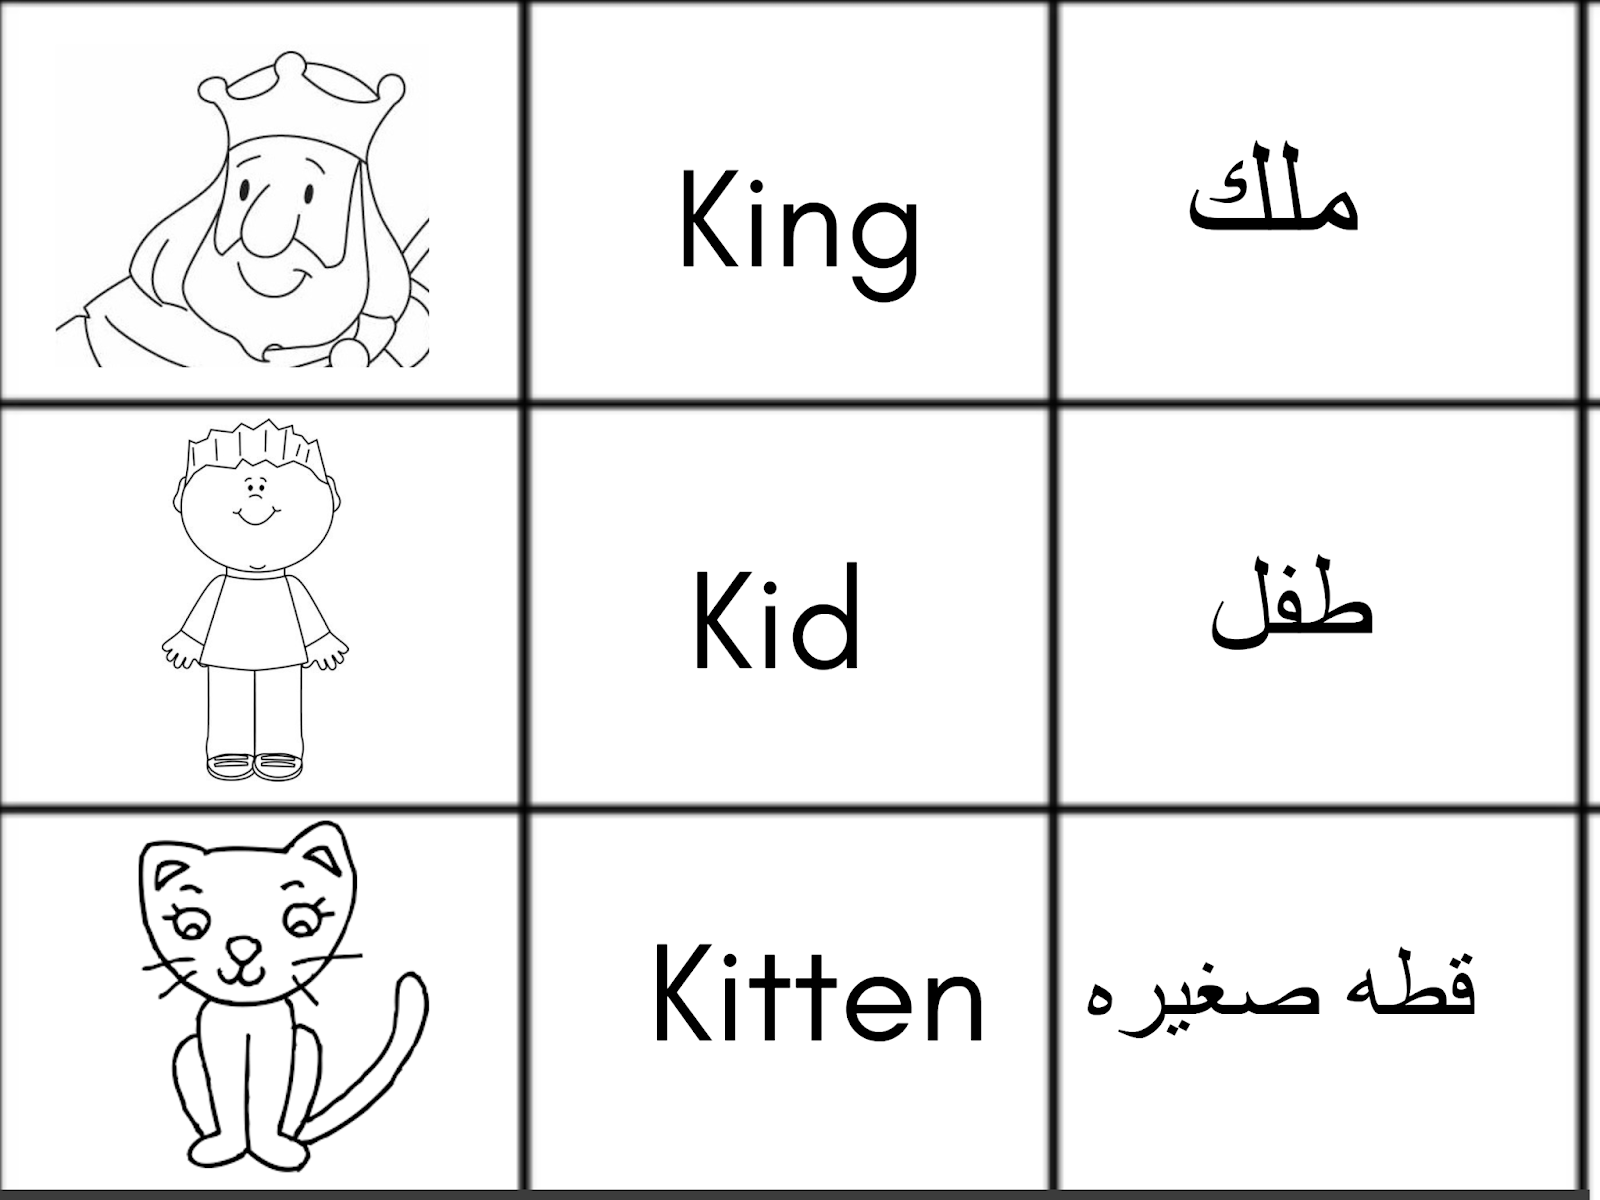 صورة كلمات بحرف k , صور و كلمات مزخرفه بحرف k 3731 1